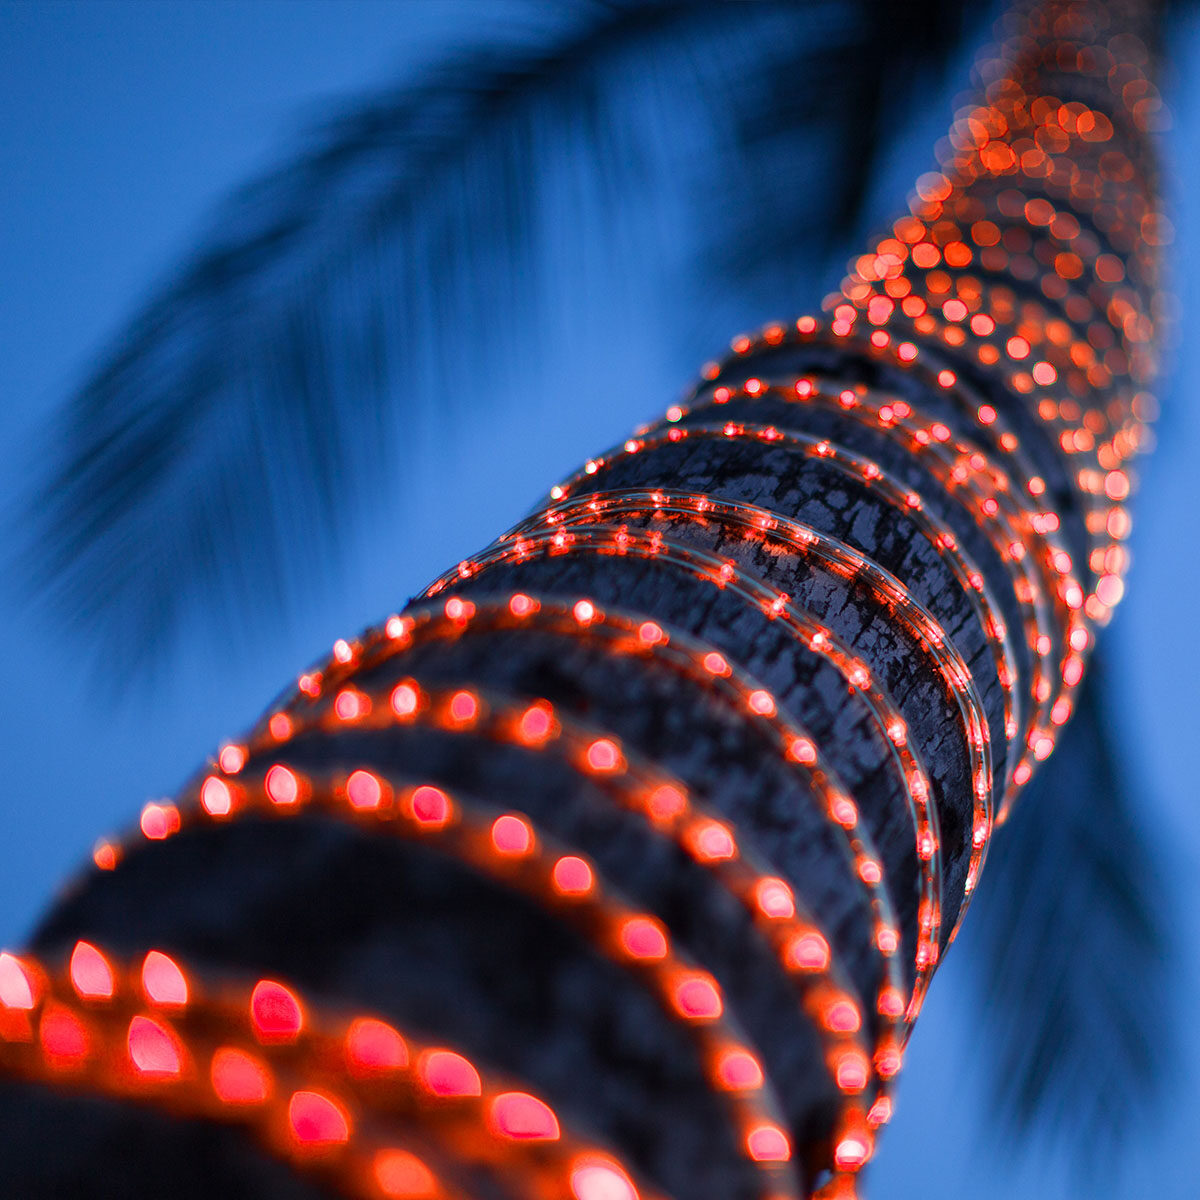 Rope Light Wrapped Around A Palm Tree